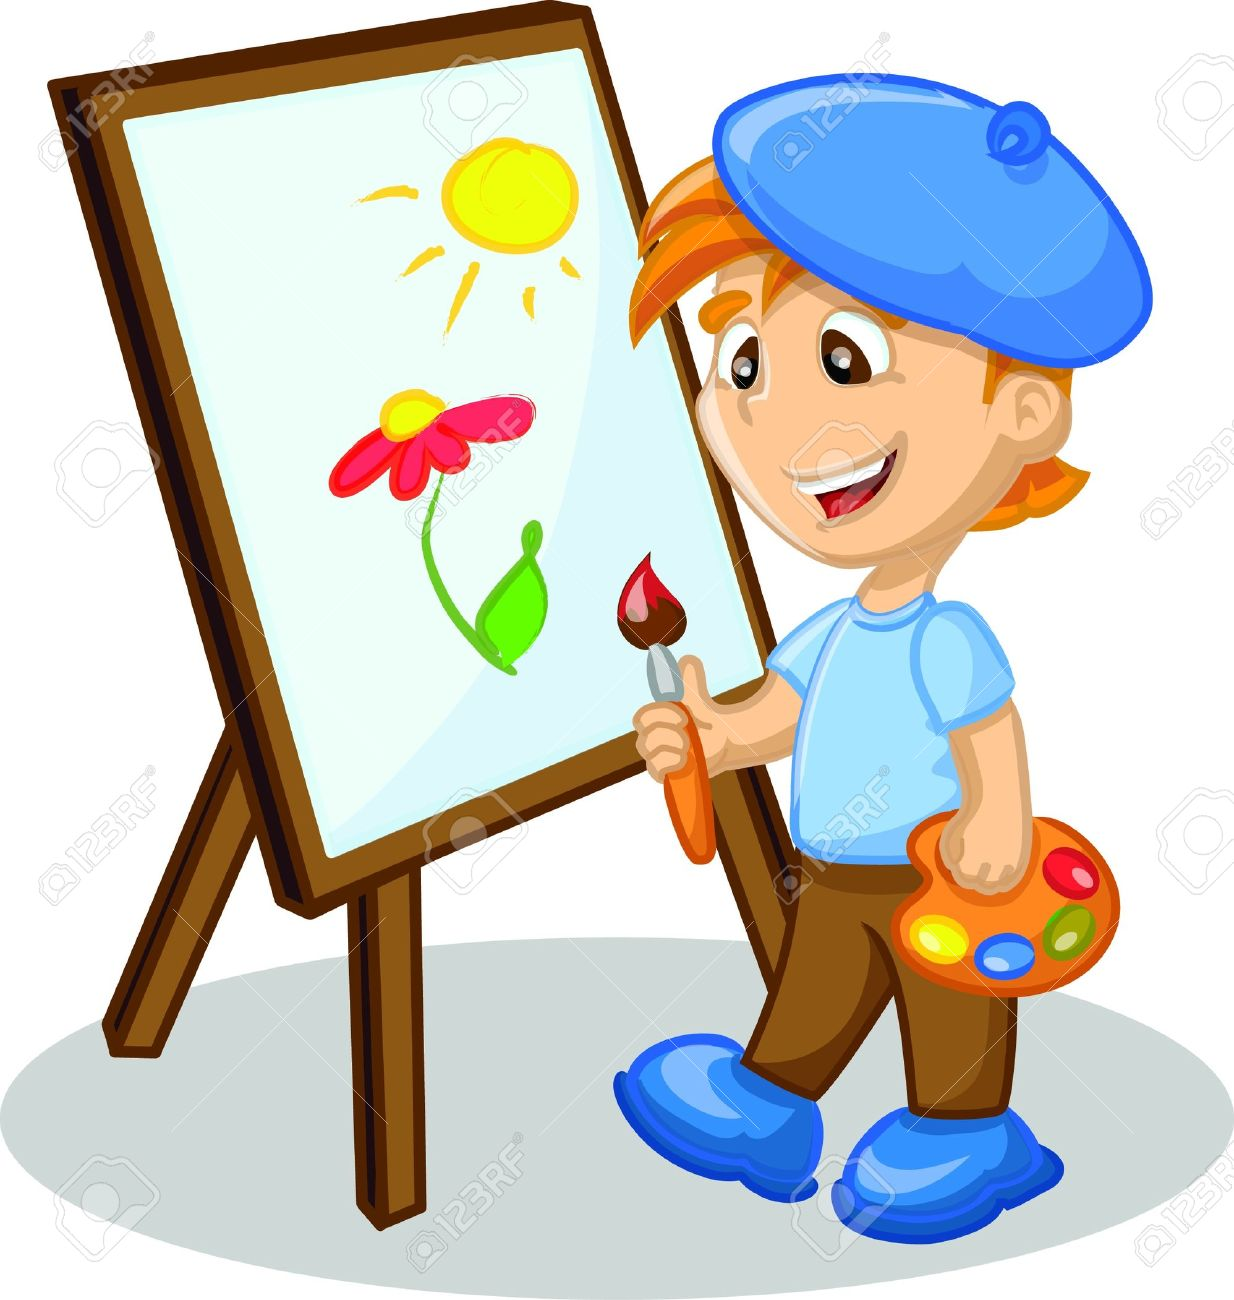 1234x1300 Boy Painting Clipart, Explore Pictures